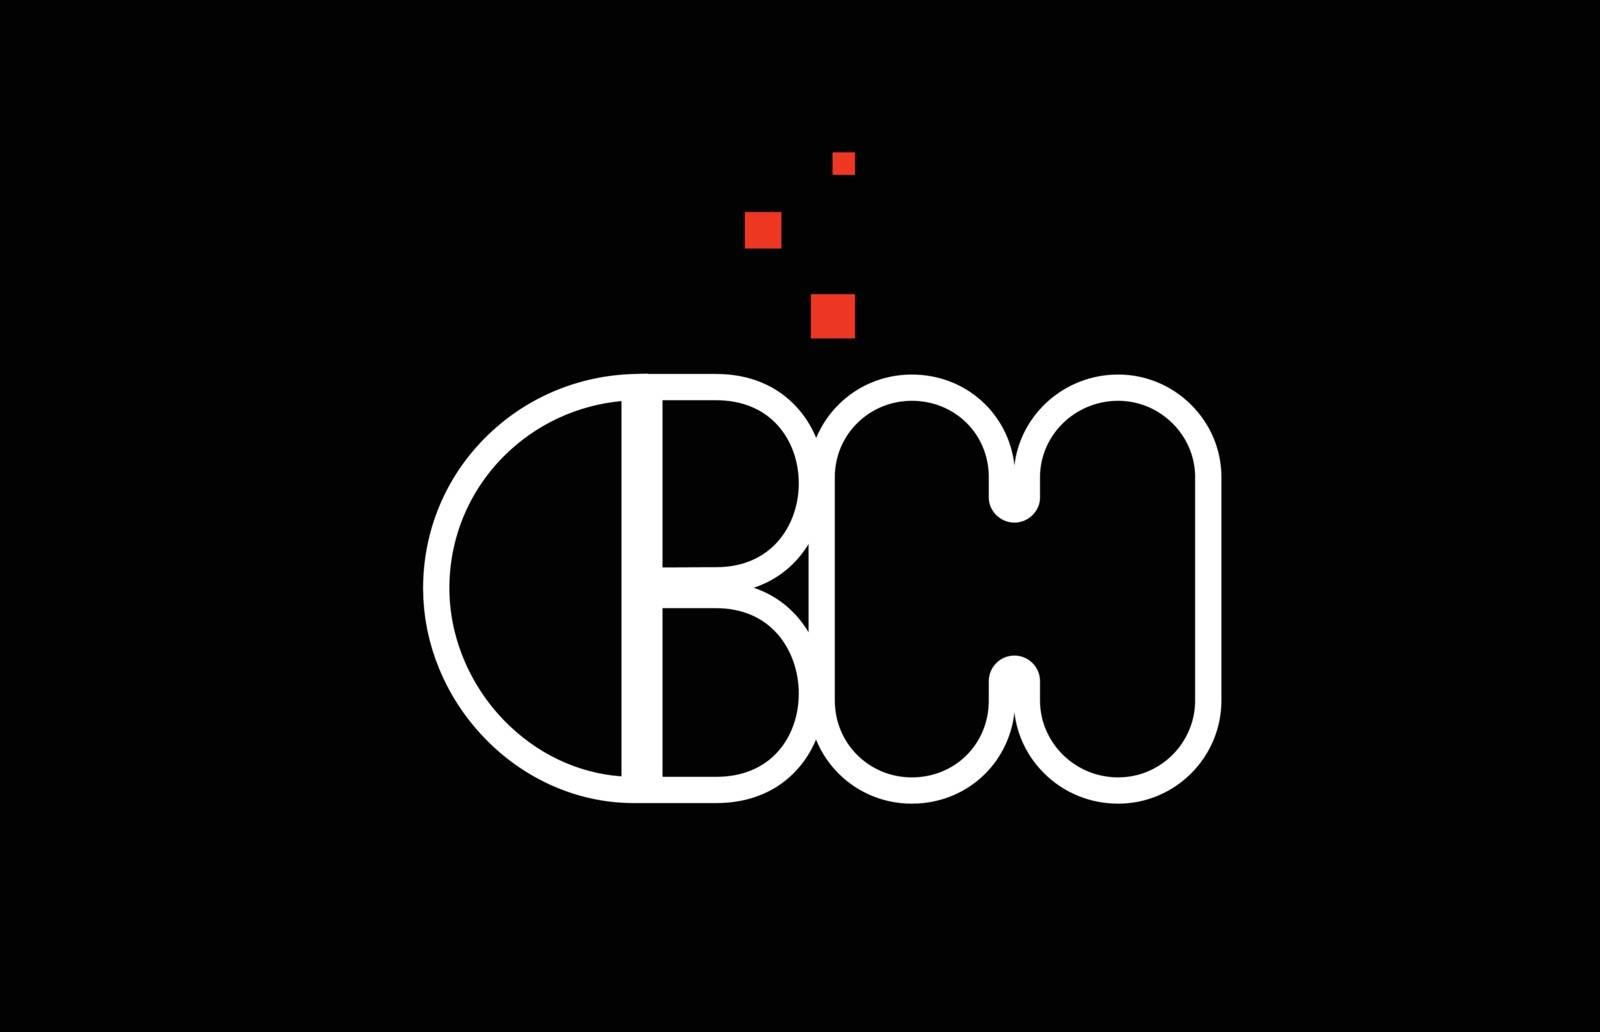 CH C H black white red alphabet letter combination logo icon des by dragomirescu